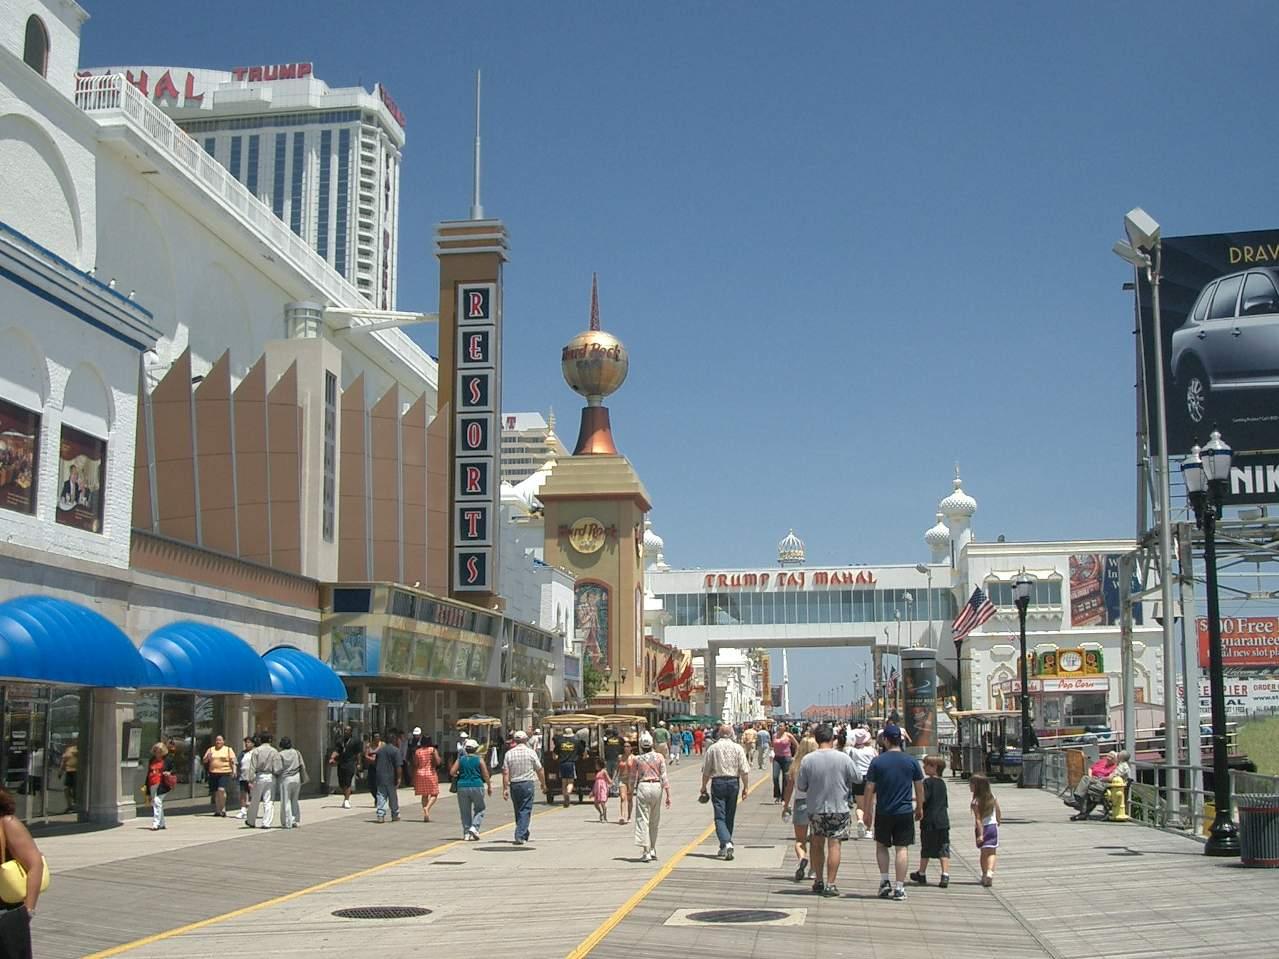 Atlantic City Boardwalk Nj Things To Do In Atlantic City